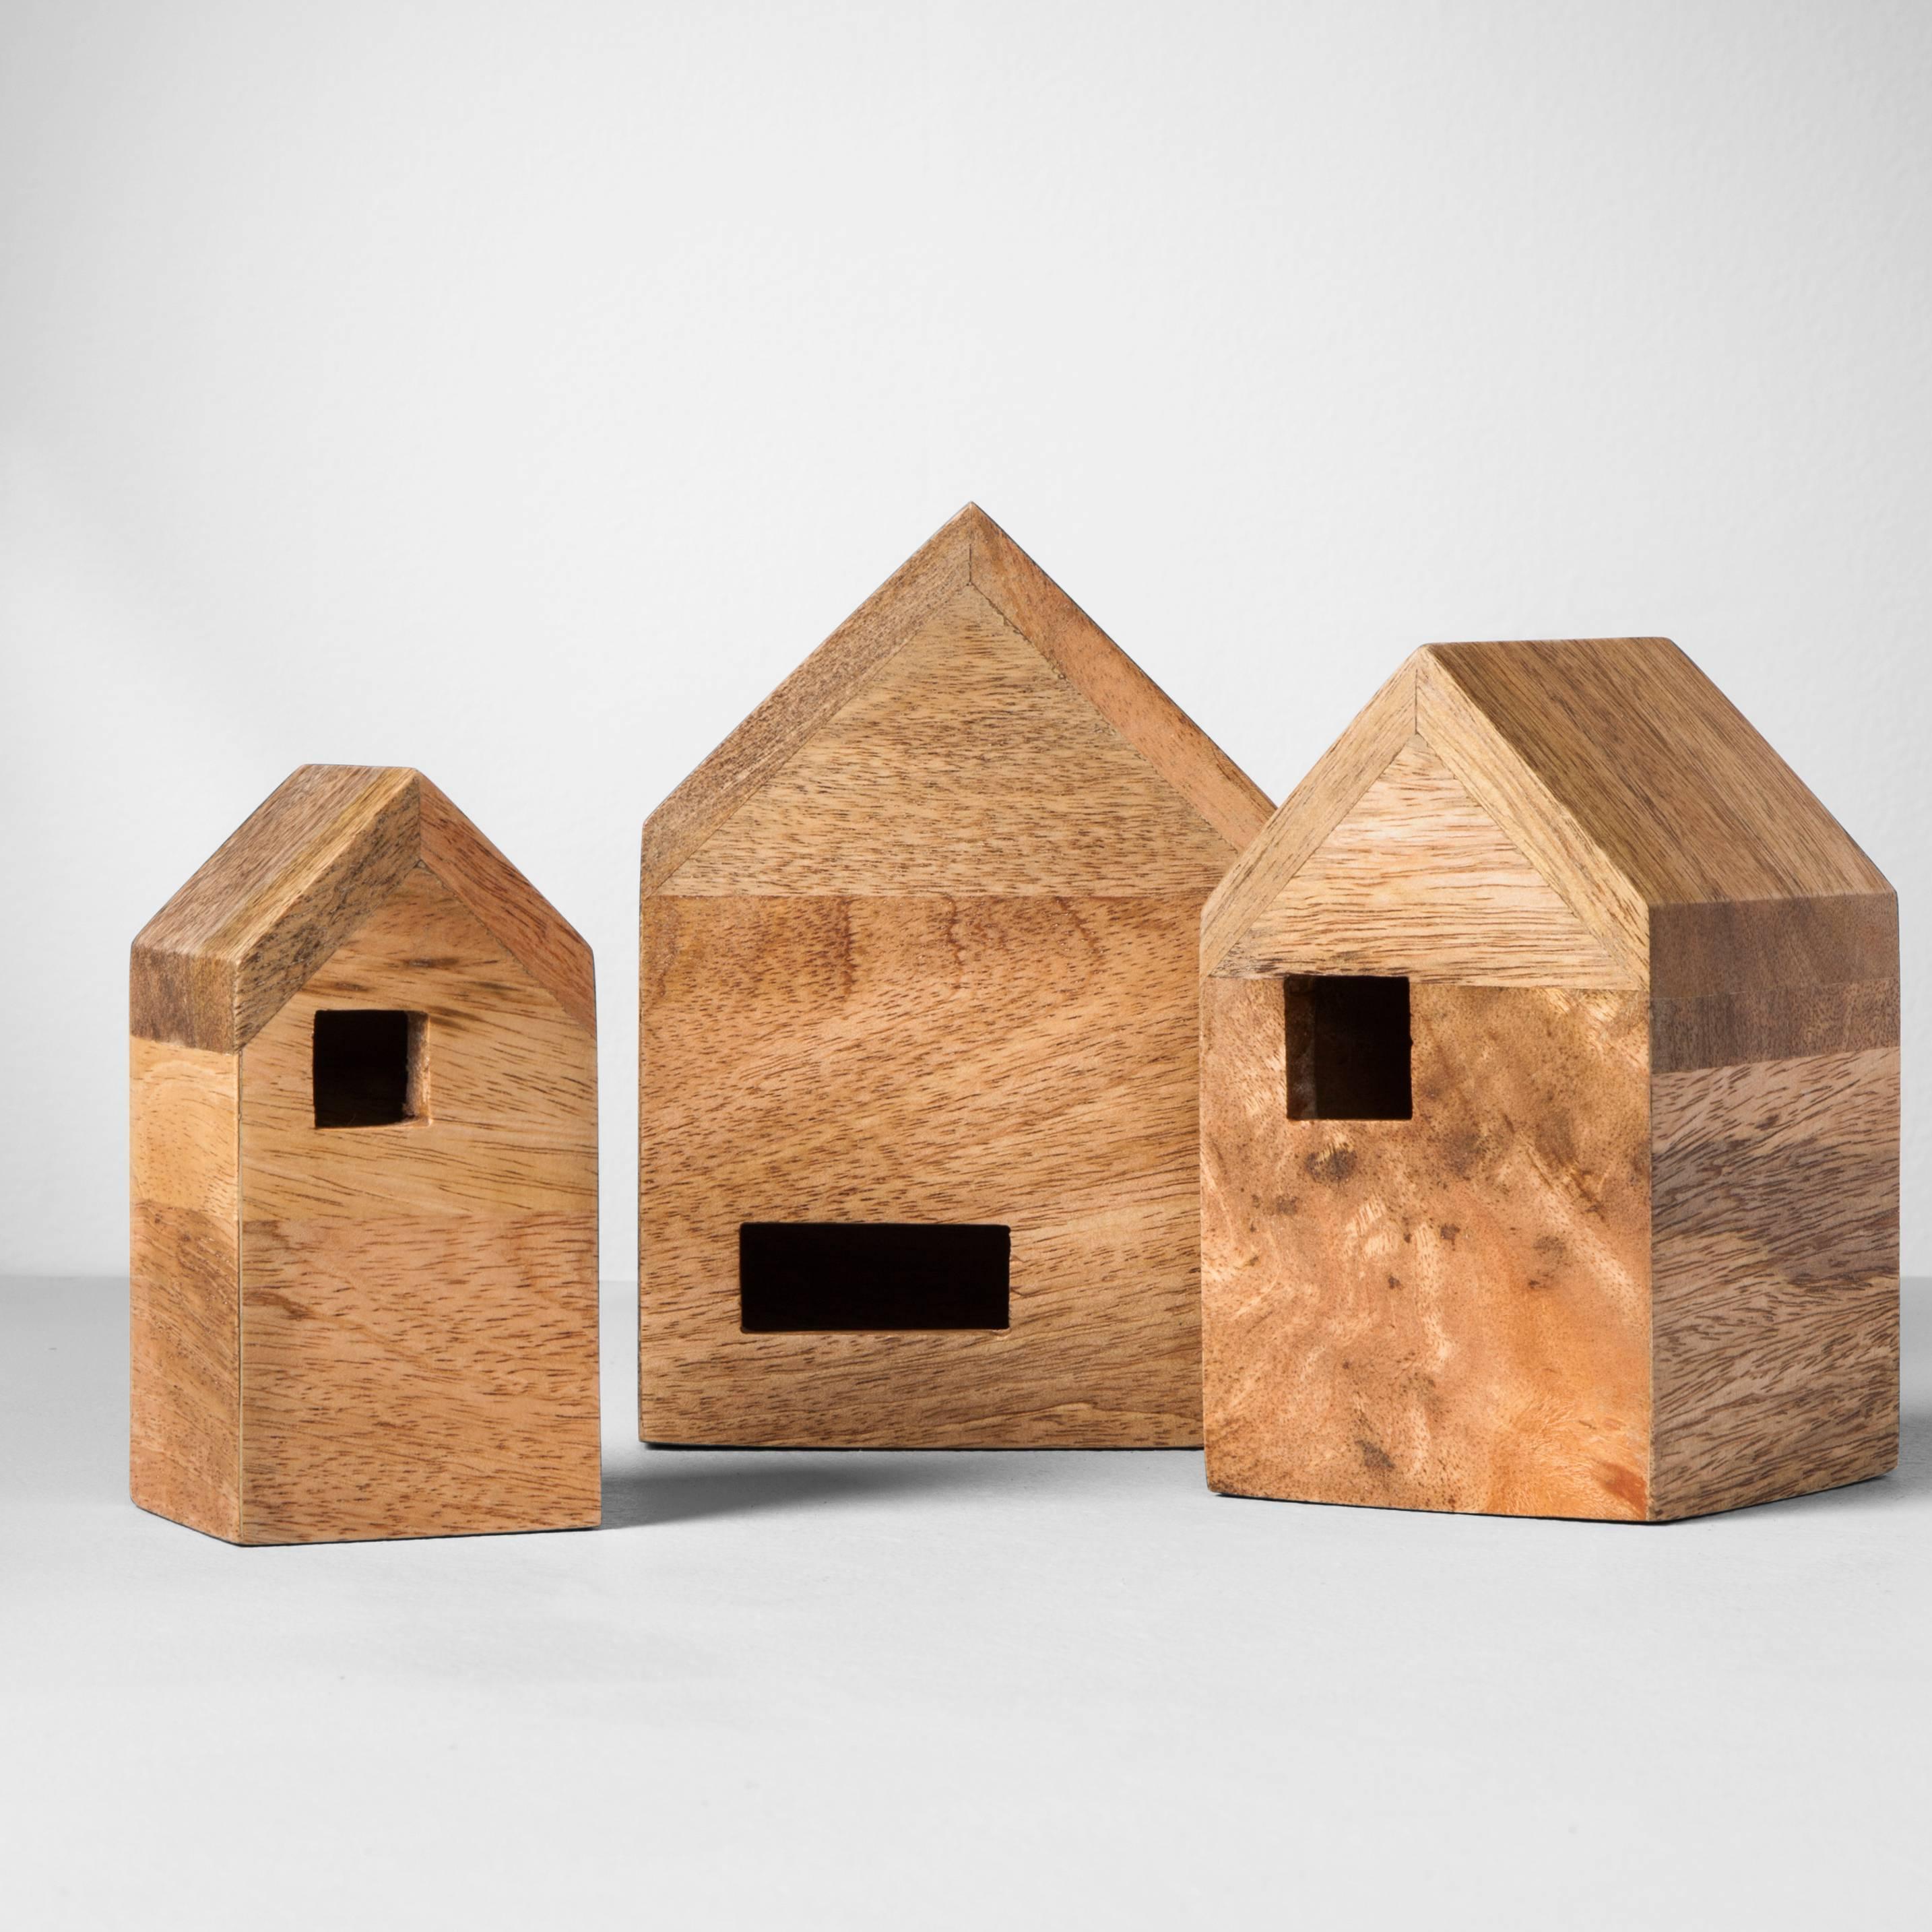 Hearth & Hand with Magnolia Wood Nesting House.jpg